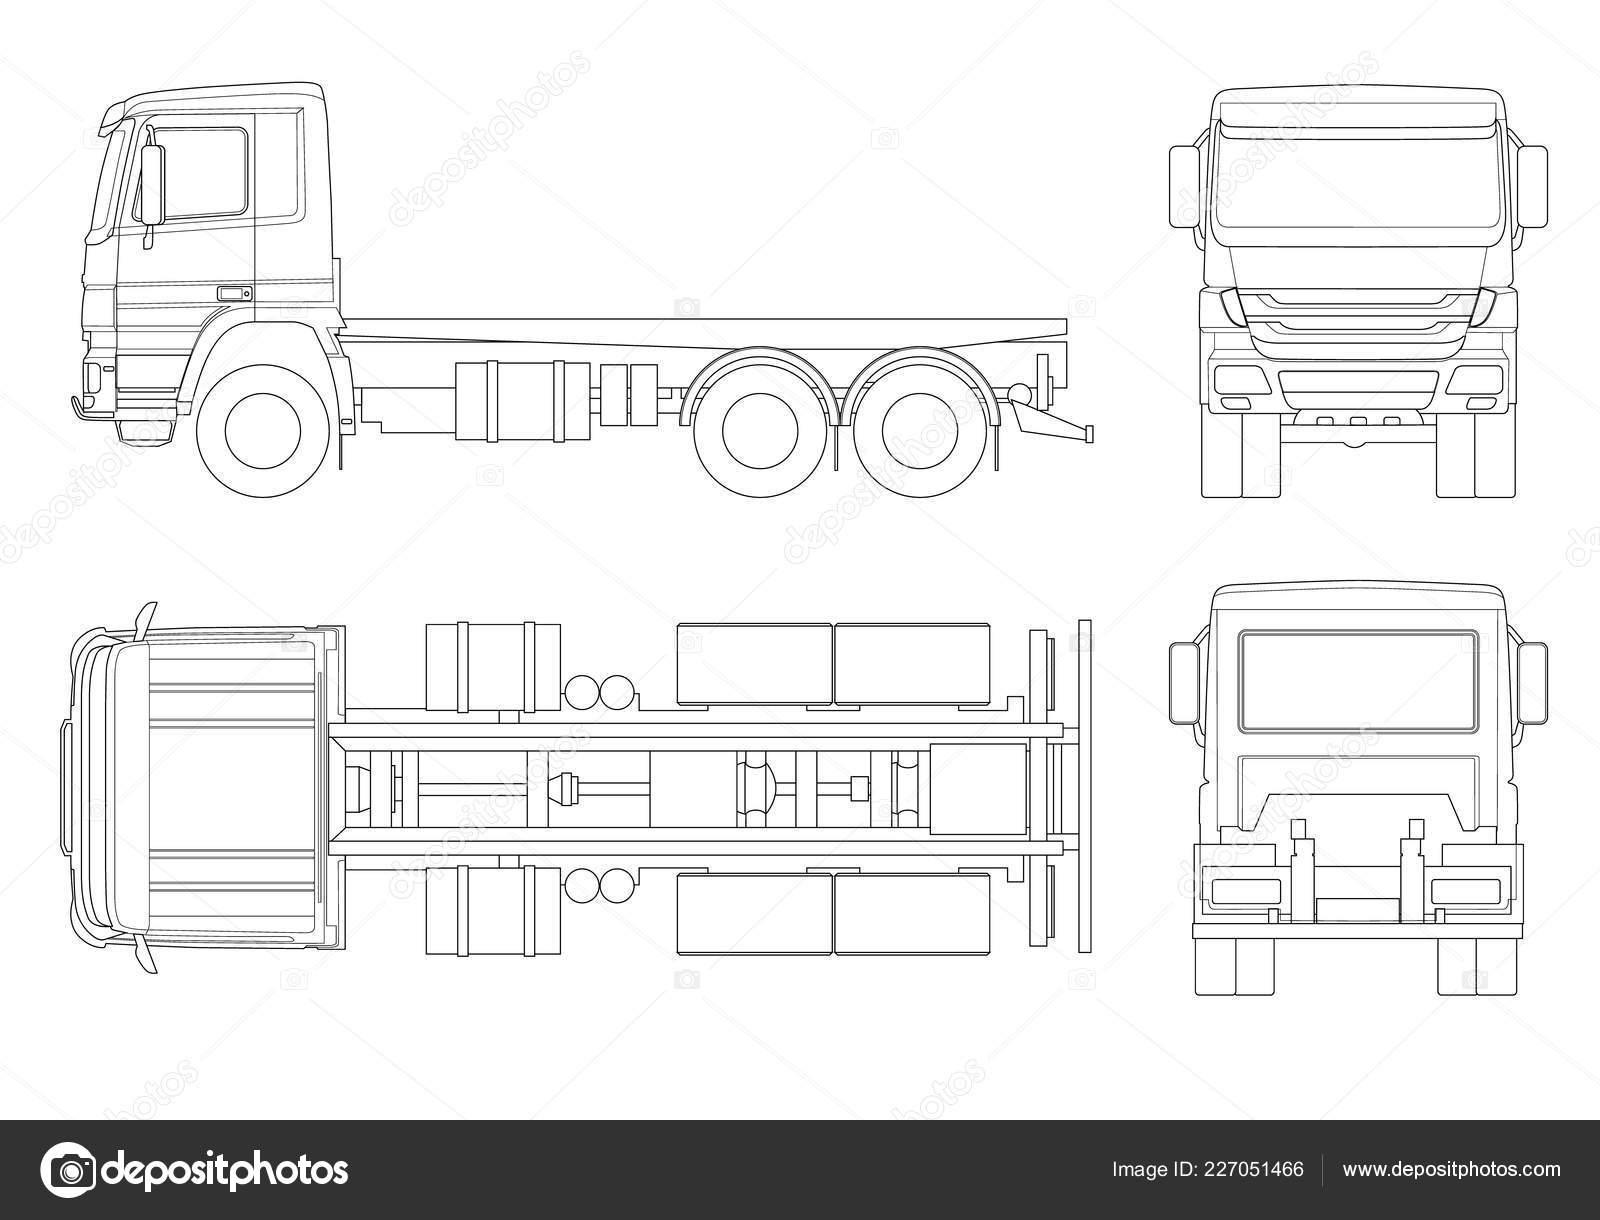 hight resolution of semi truck diagram views wiring diagram data today semi truck diagram views